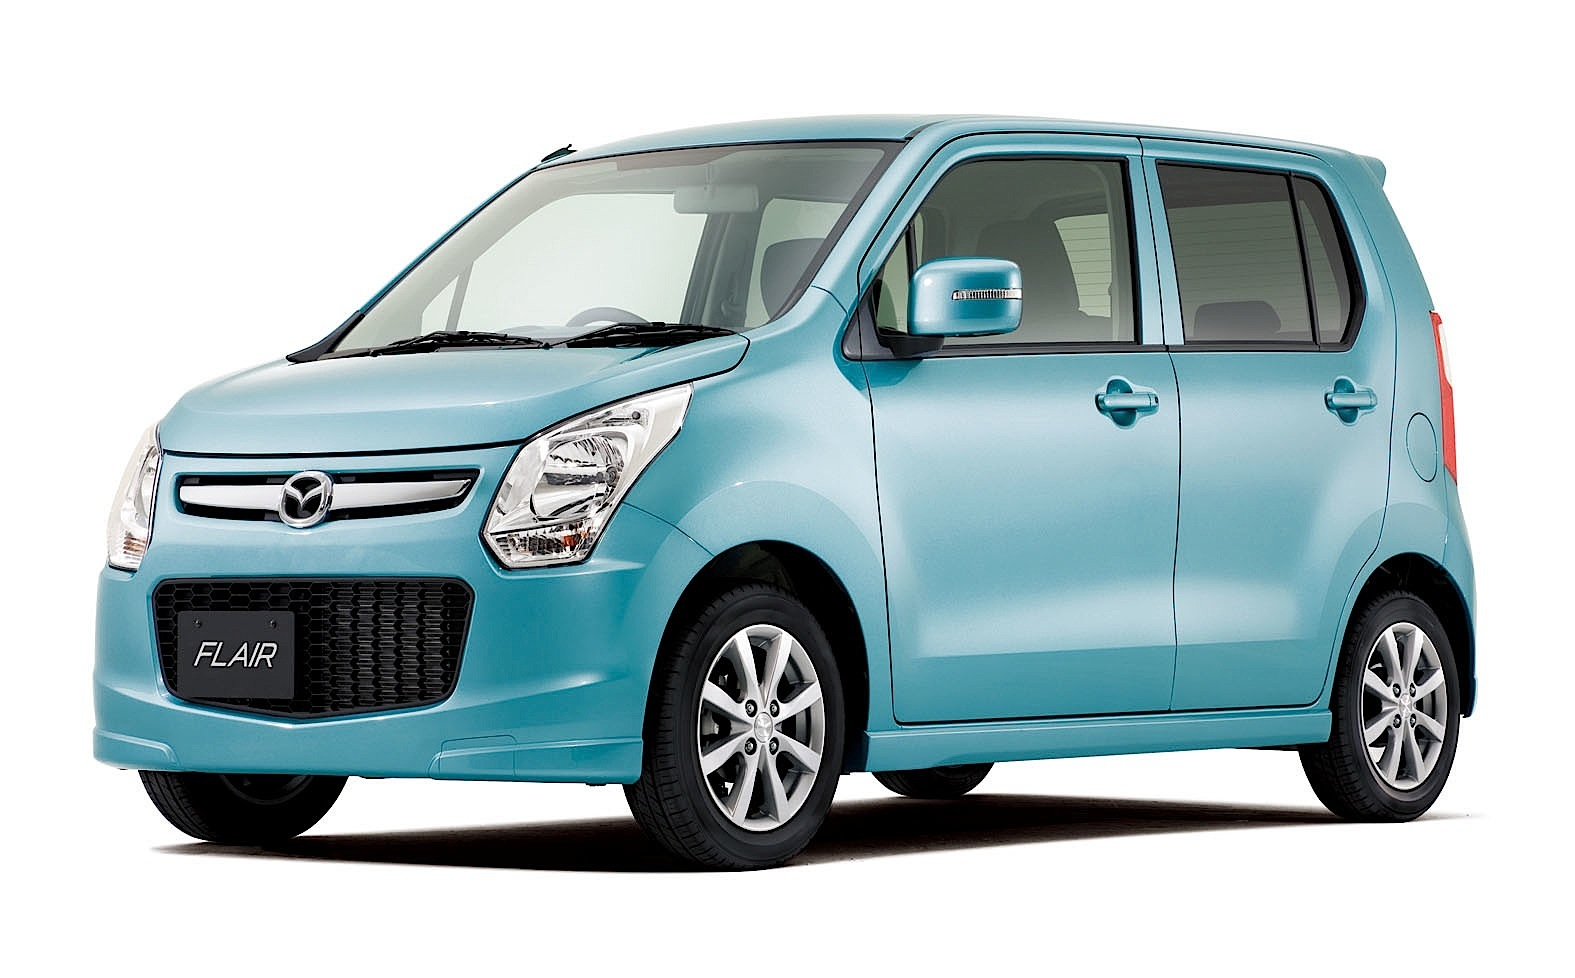 Mazda Flair I 2012 - 2014 Microvan #6